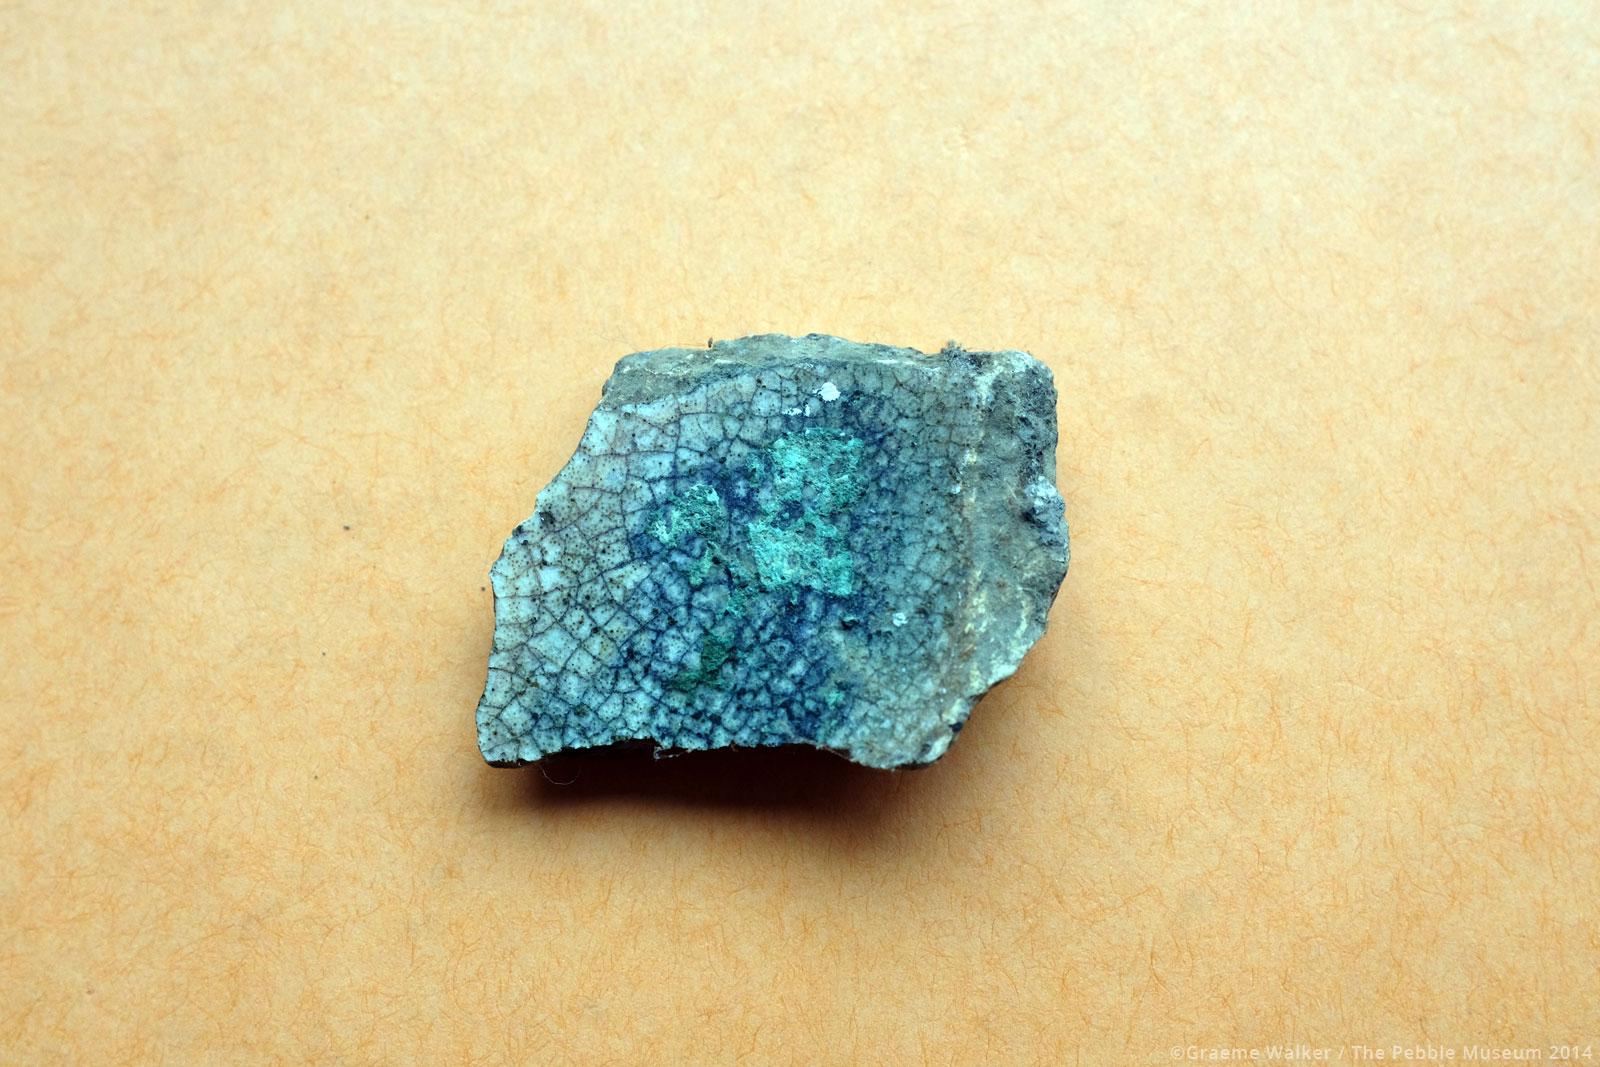 Cracked Blue Ceramic © Graeme Walker / The Pebble Museum 2019